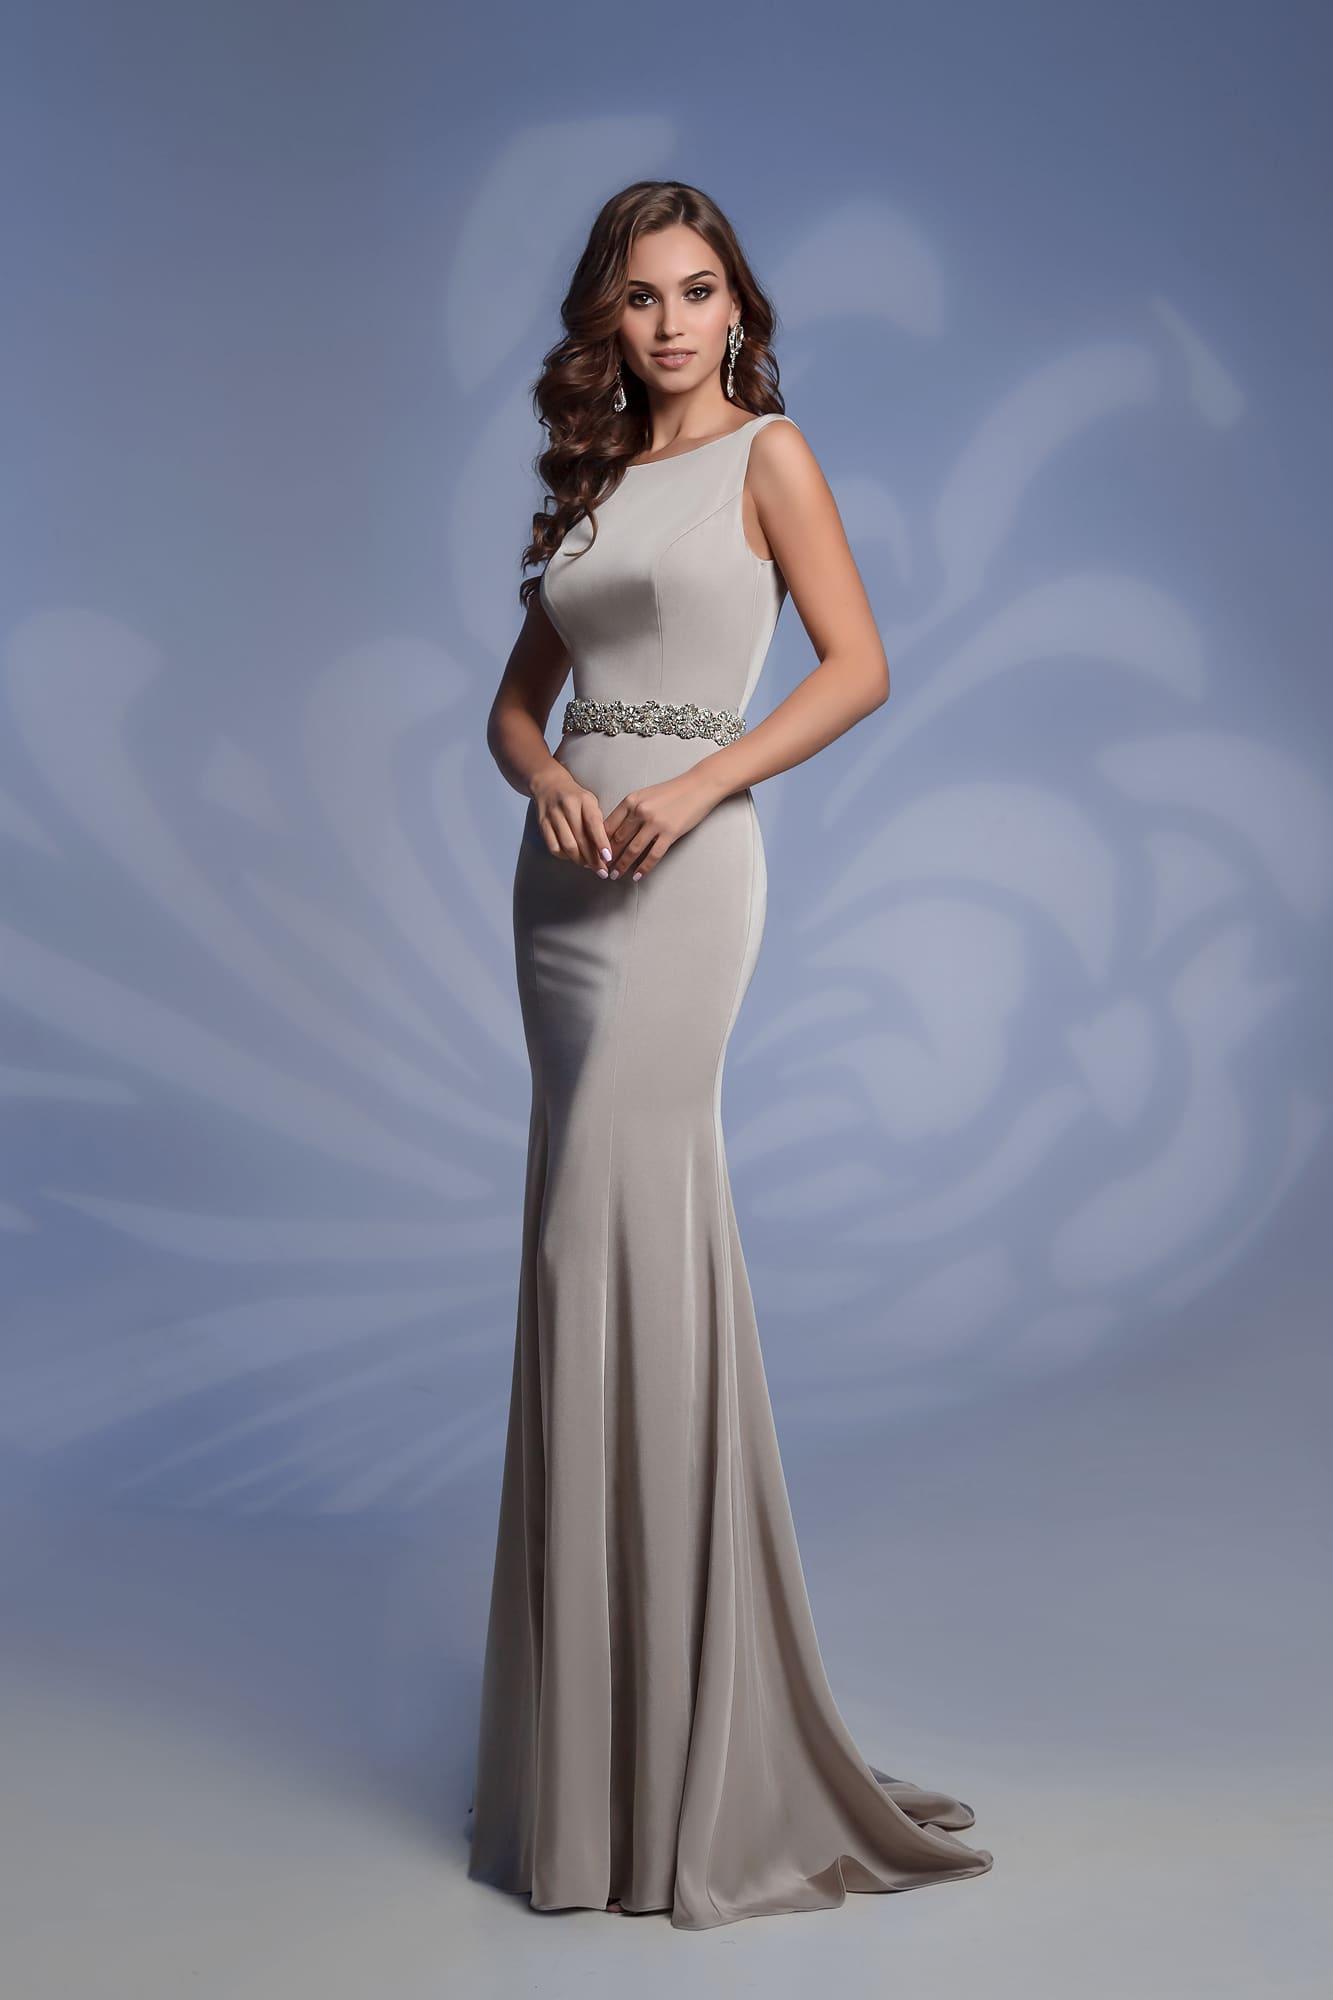 9929302e664 Платье серебристого цвета Nora Naviano 51931 silver. Купить вечернее ...